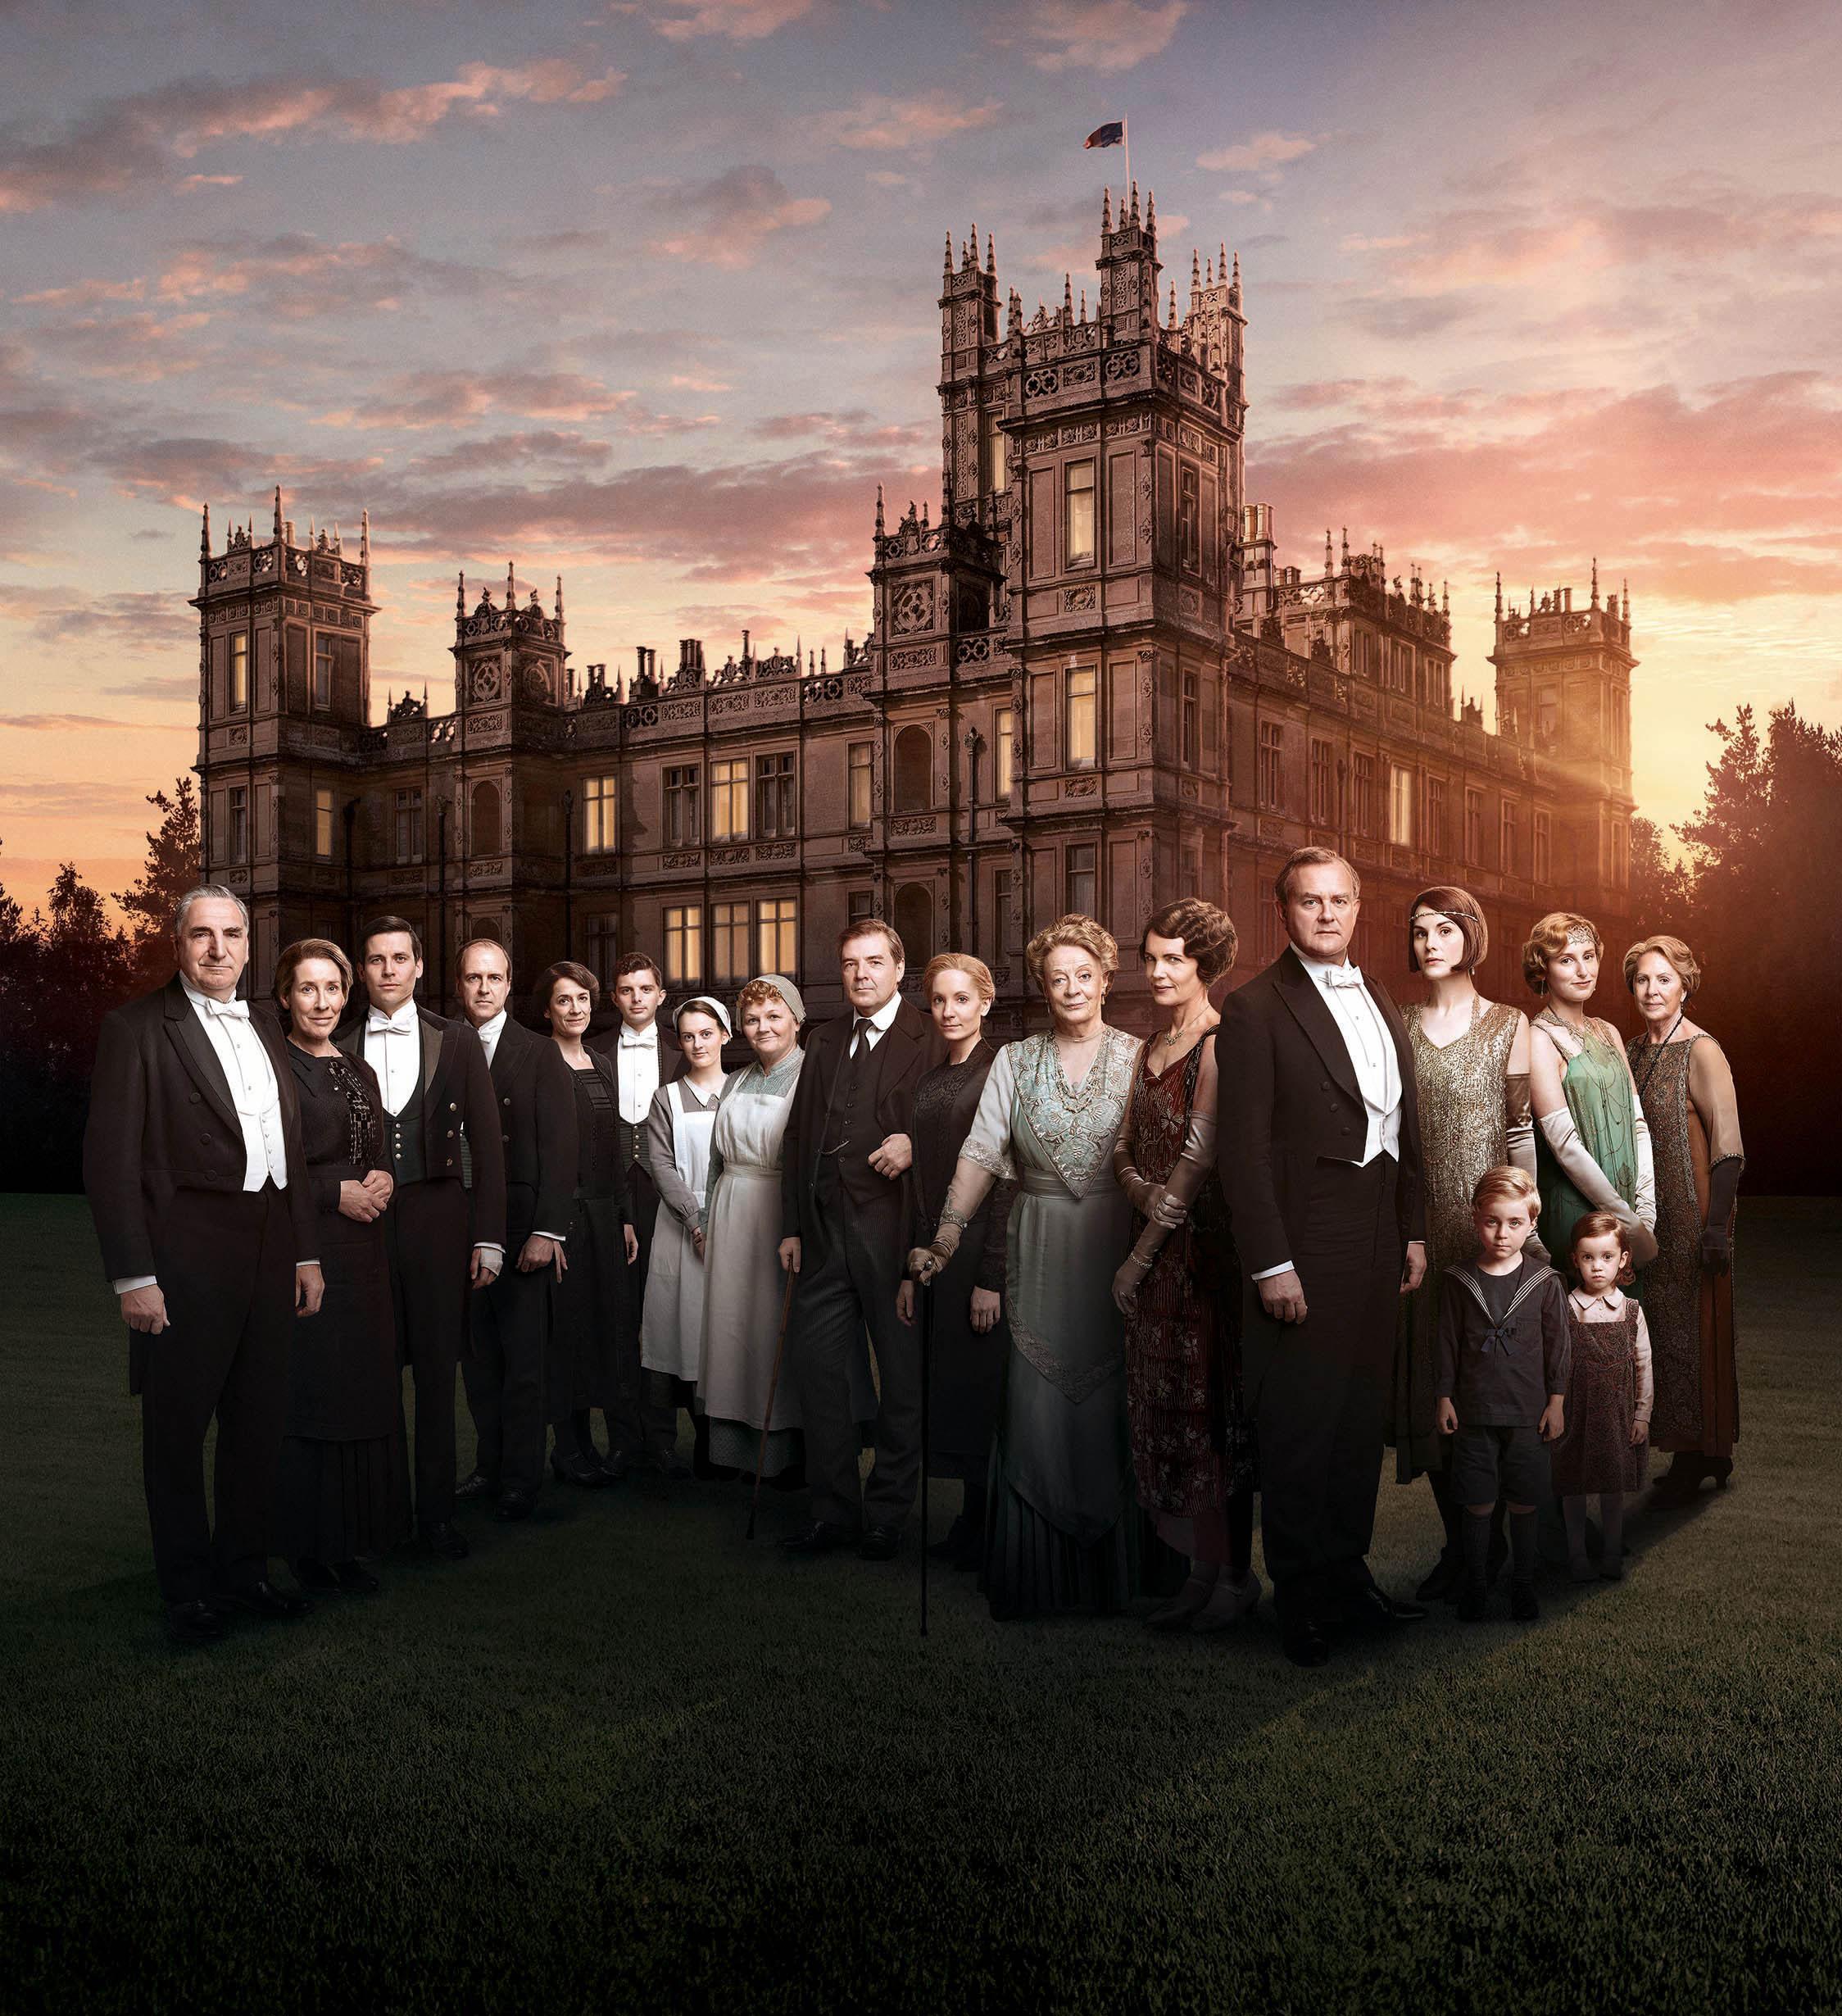 'Downton Abbey' Season 6: EP Gareth Neame on Period Drama's Final Hours